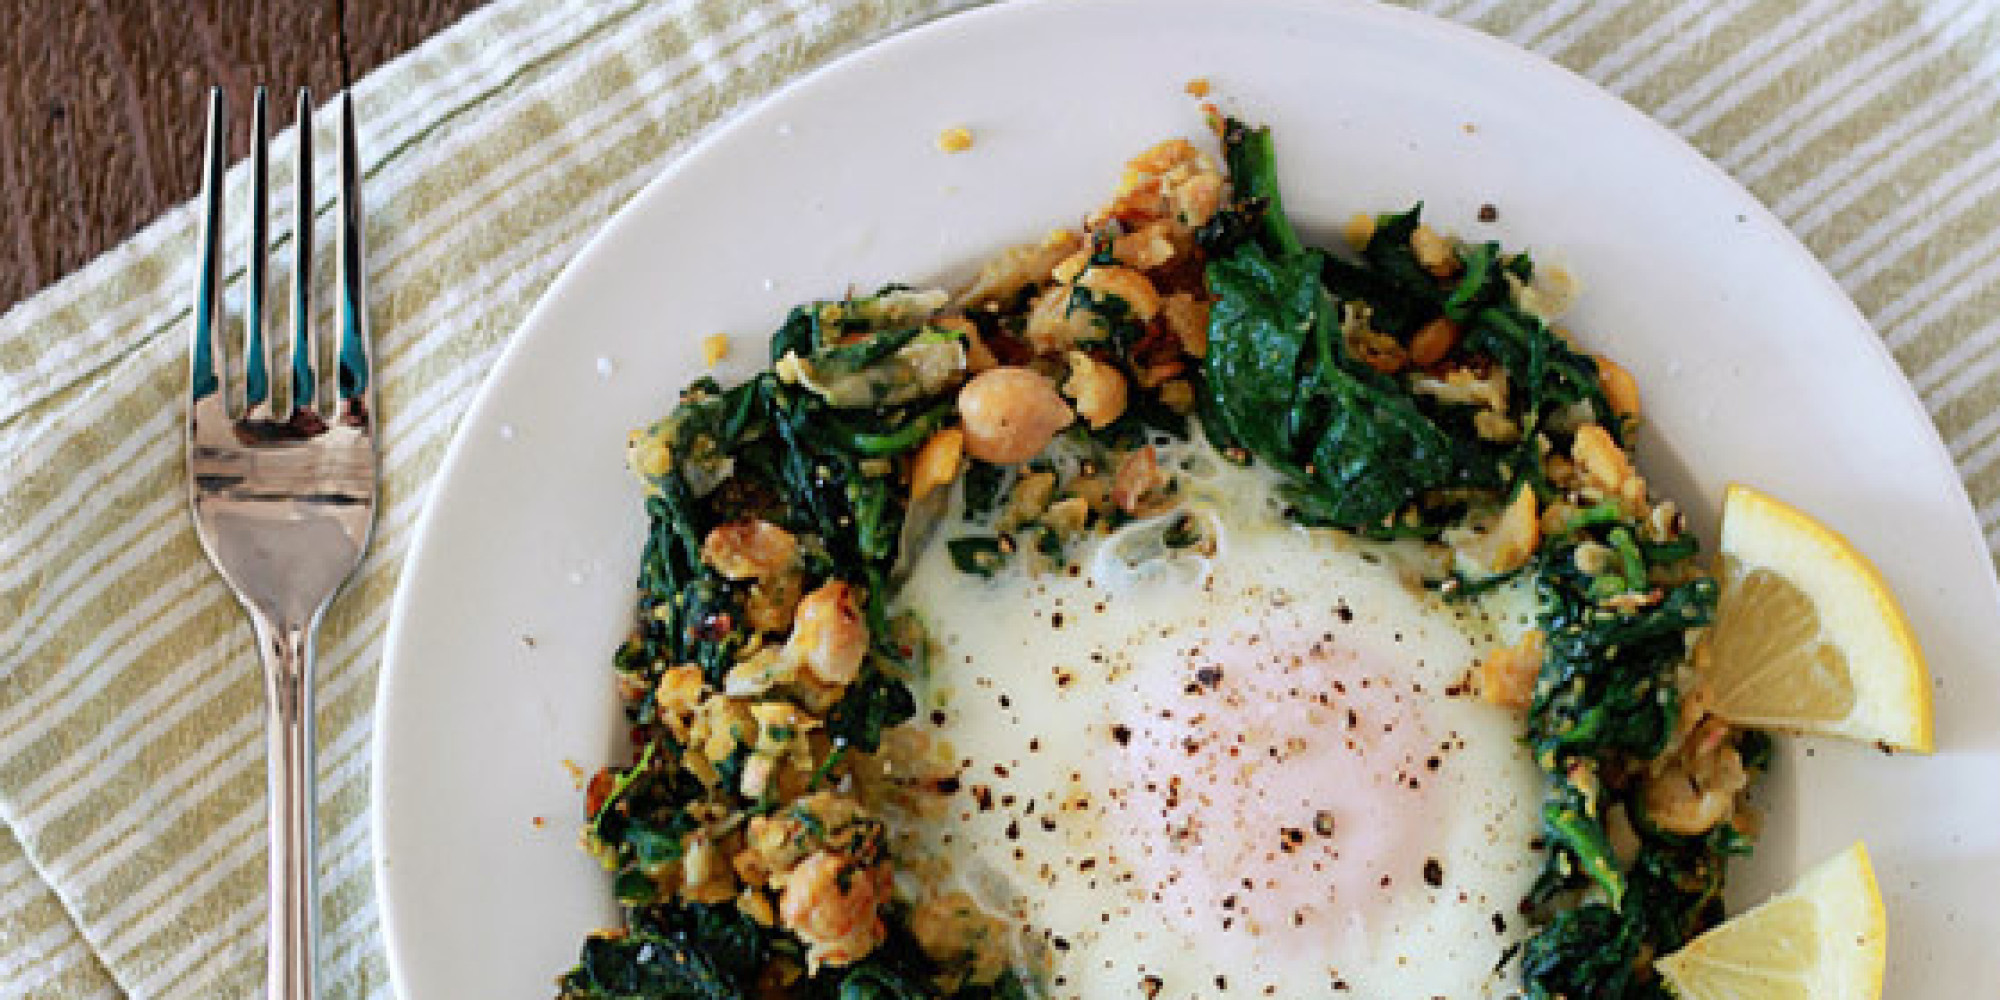 Vegetarian Protein Breakfast  19 Ve arian Ways To Eat More Protein For Breakfast